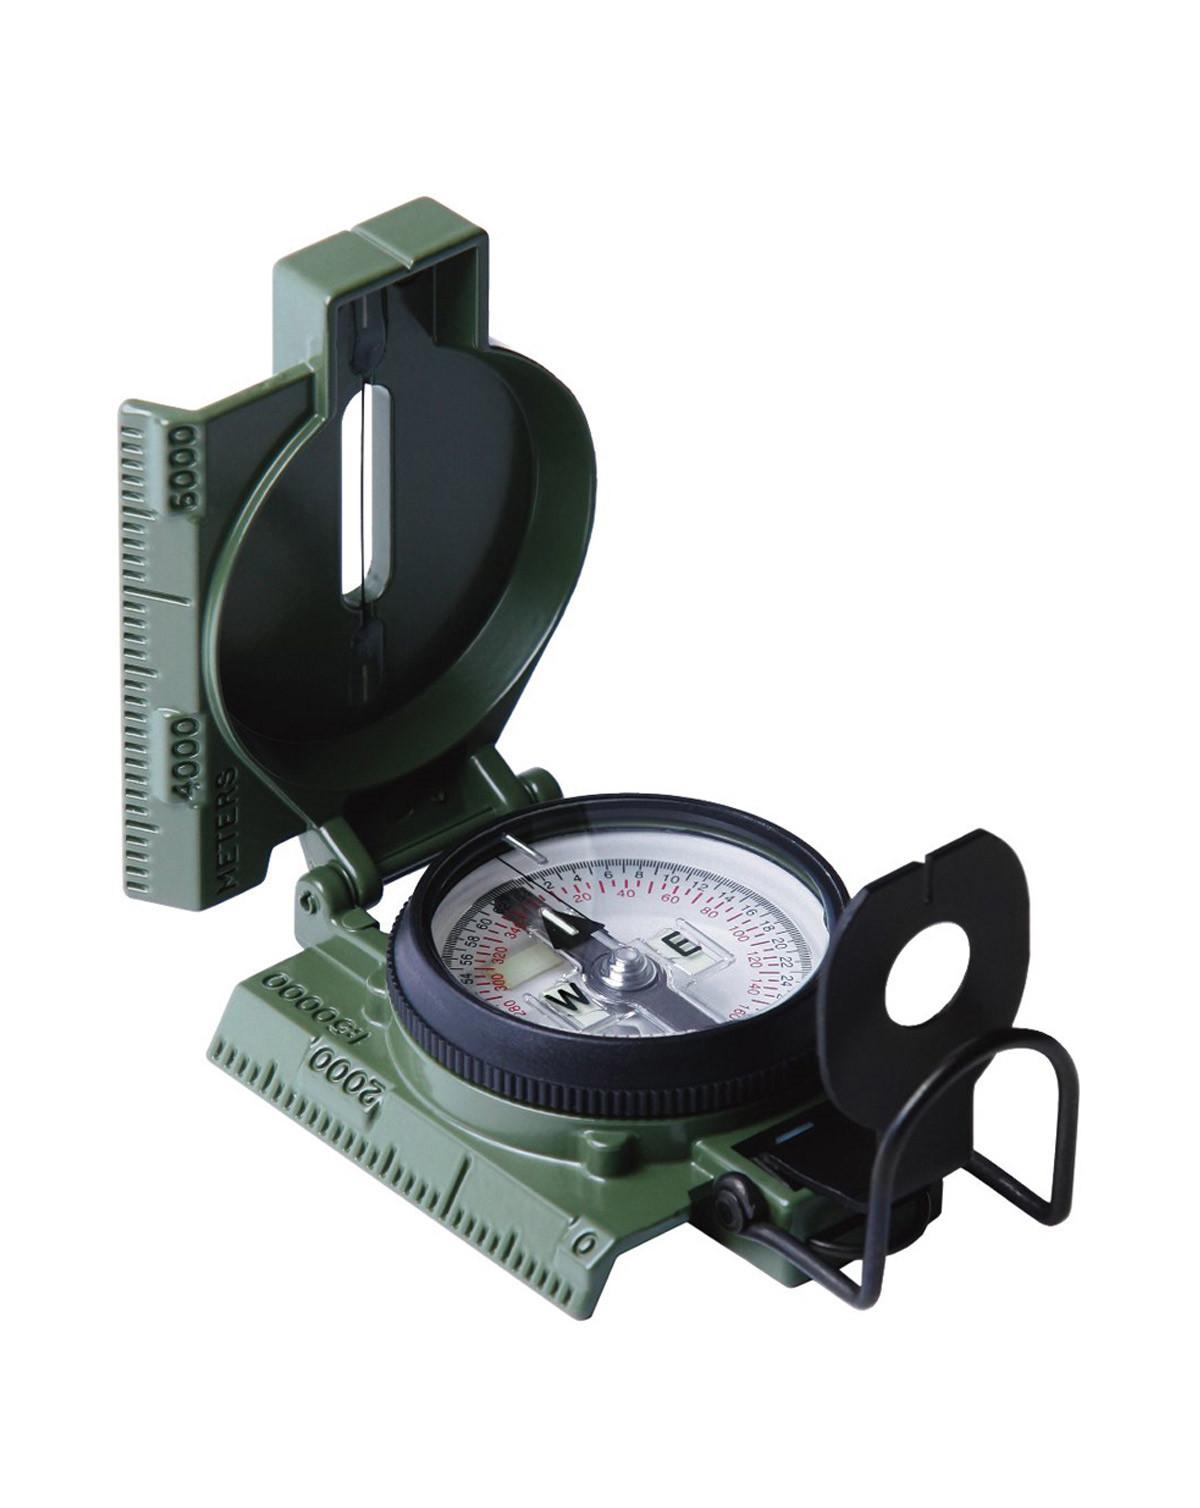 Rothco Kompas - Cammenga G.I. Military Phosphorescent Lensatic (Oliven, One Size) (613902041509)